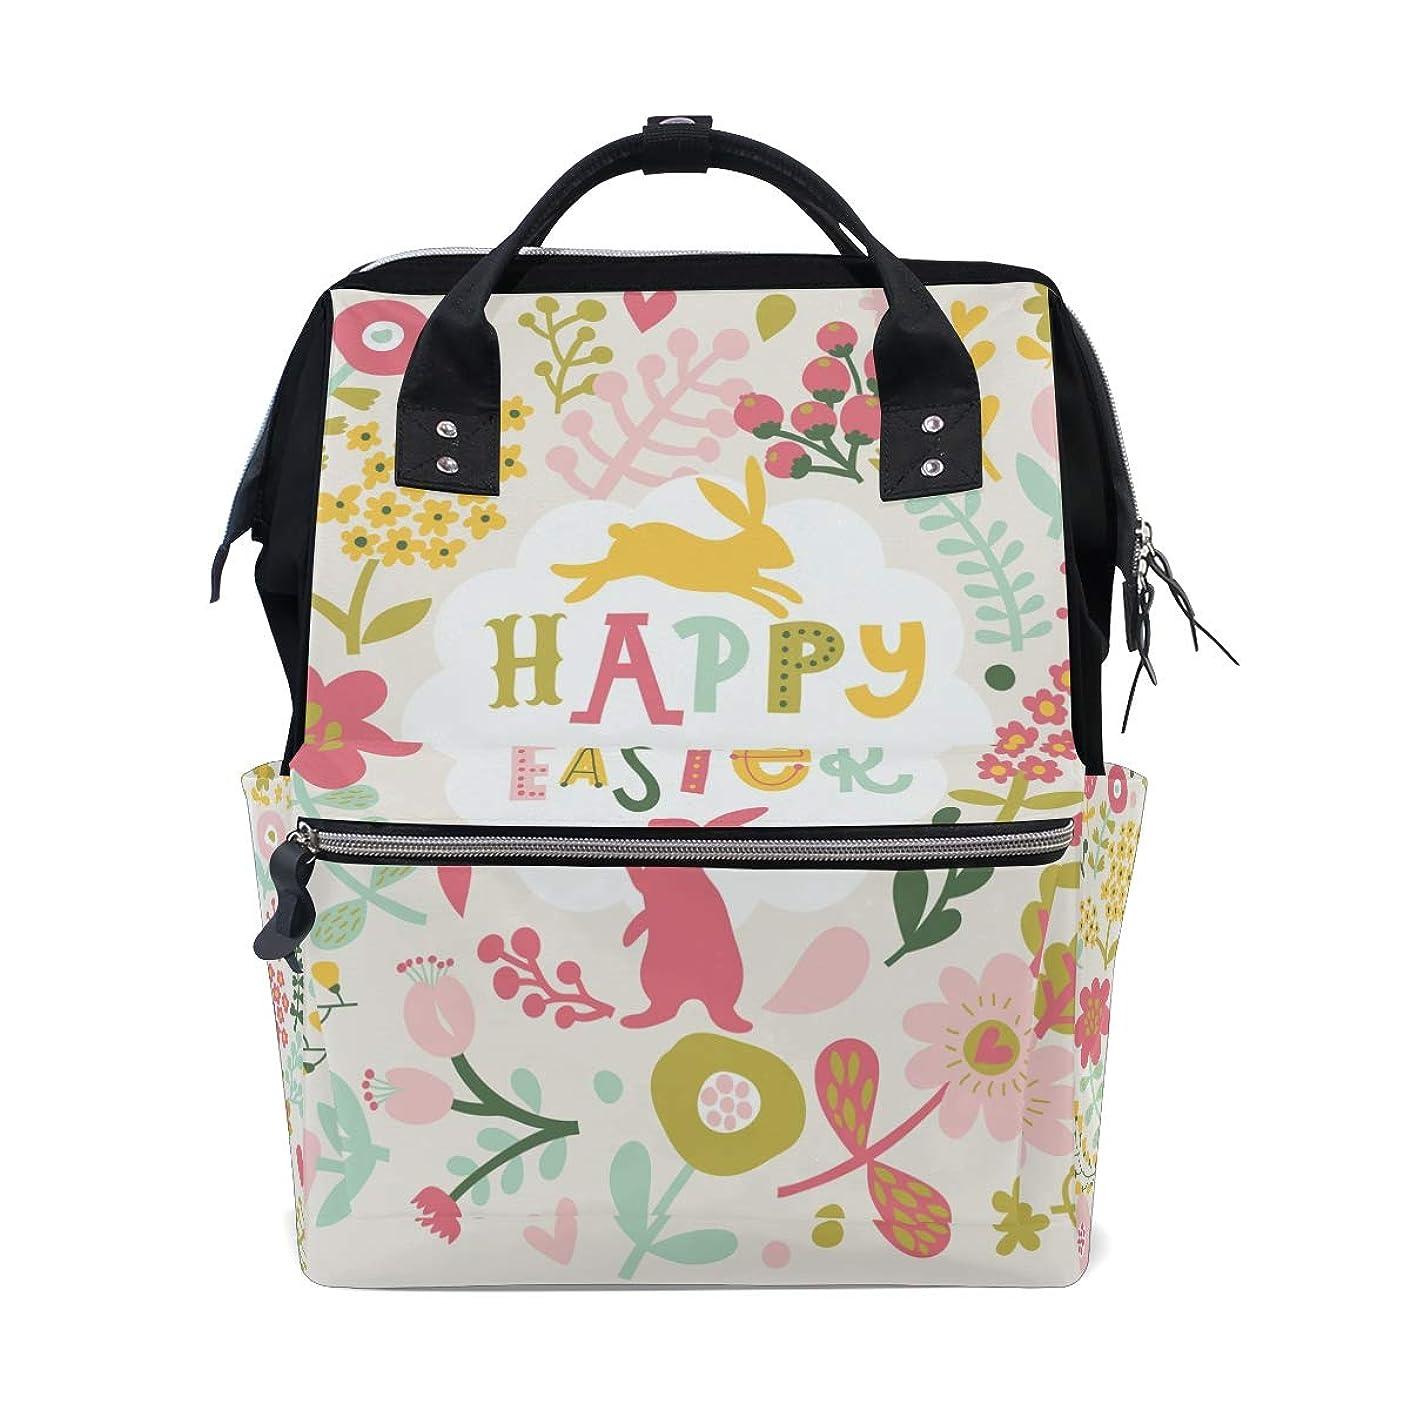 Happy Easter Eggs Rabbit Flowers School Backpack Large Capacity Mummy Bags Laptop Handbag Casual Travel Rucksack Satchel For Women Men Adult Teen Children